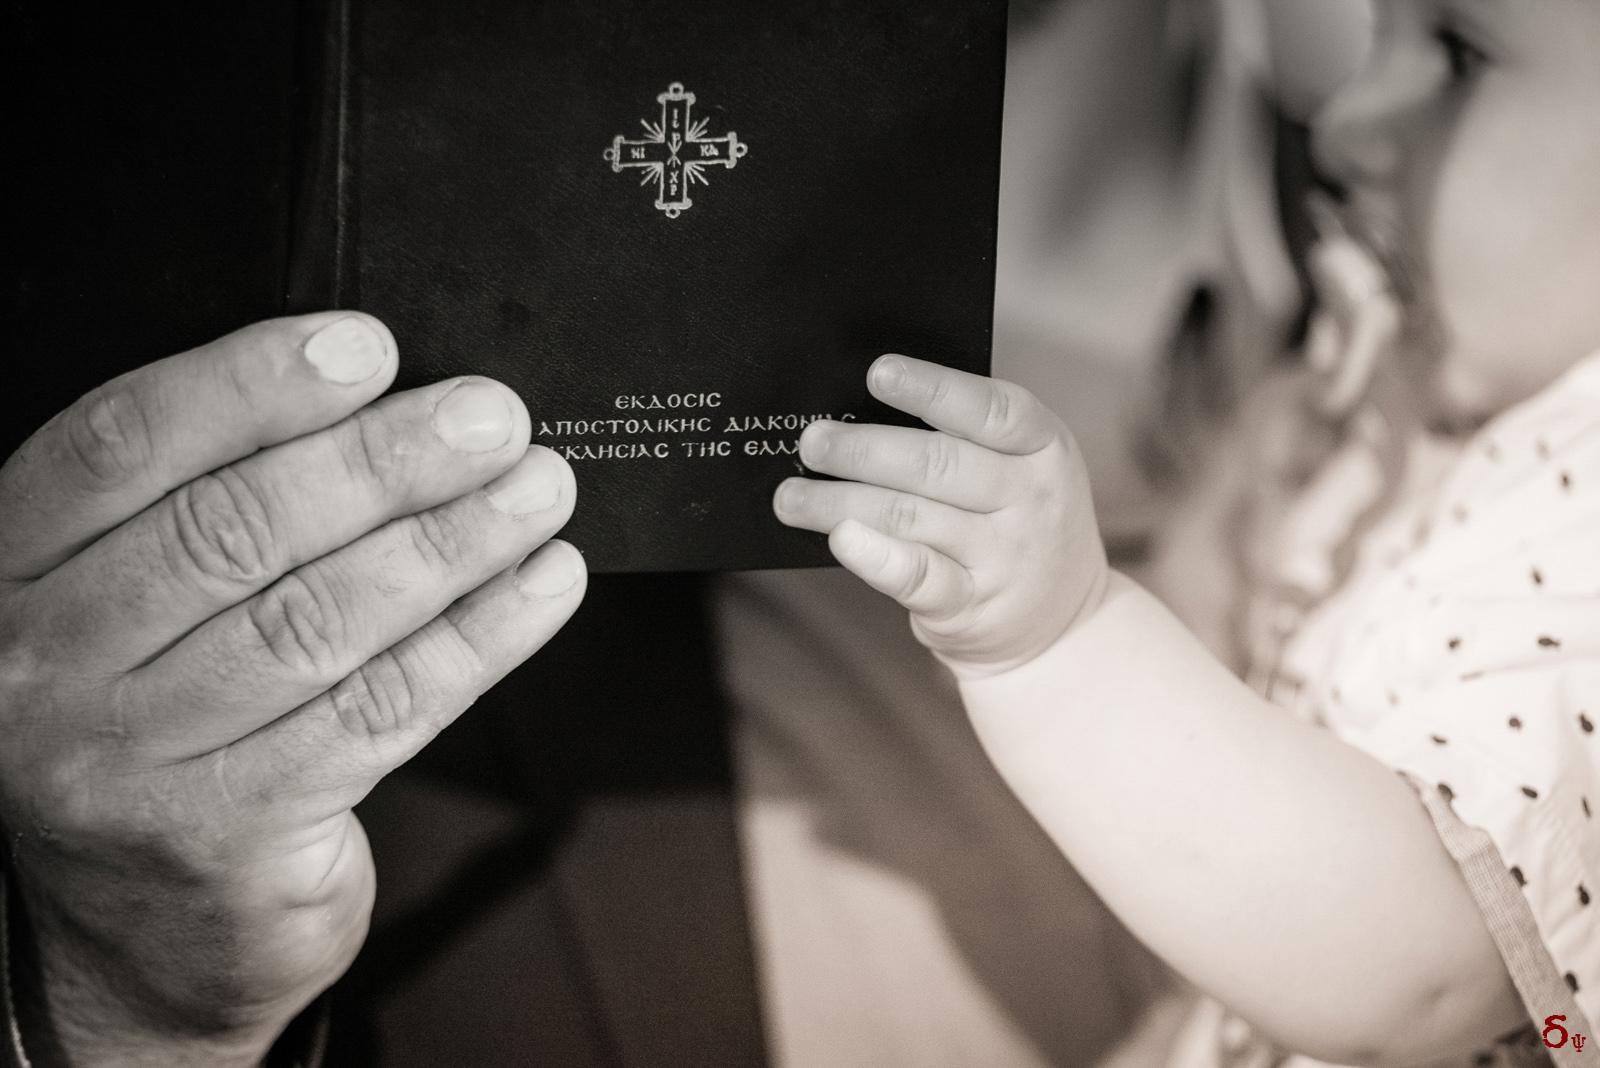 spiritual journey baby hands christening day baptism photographer bw hands greek orthodox church boys baptism